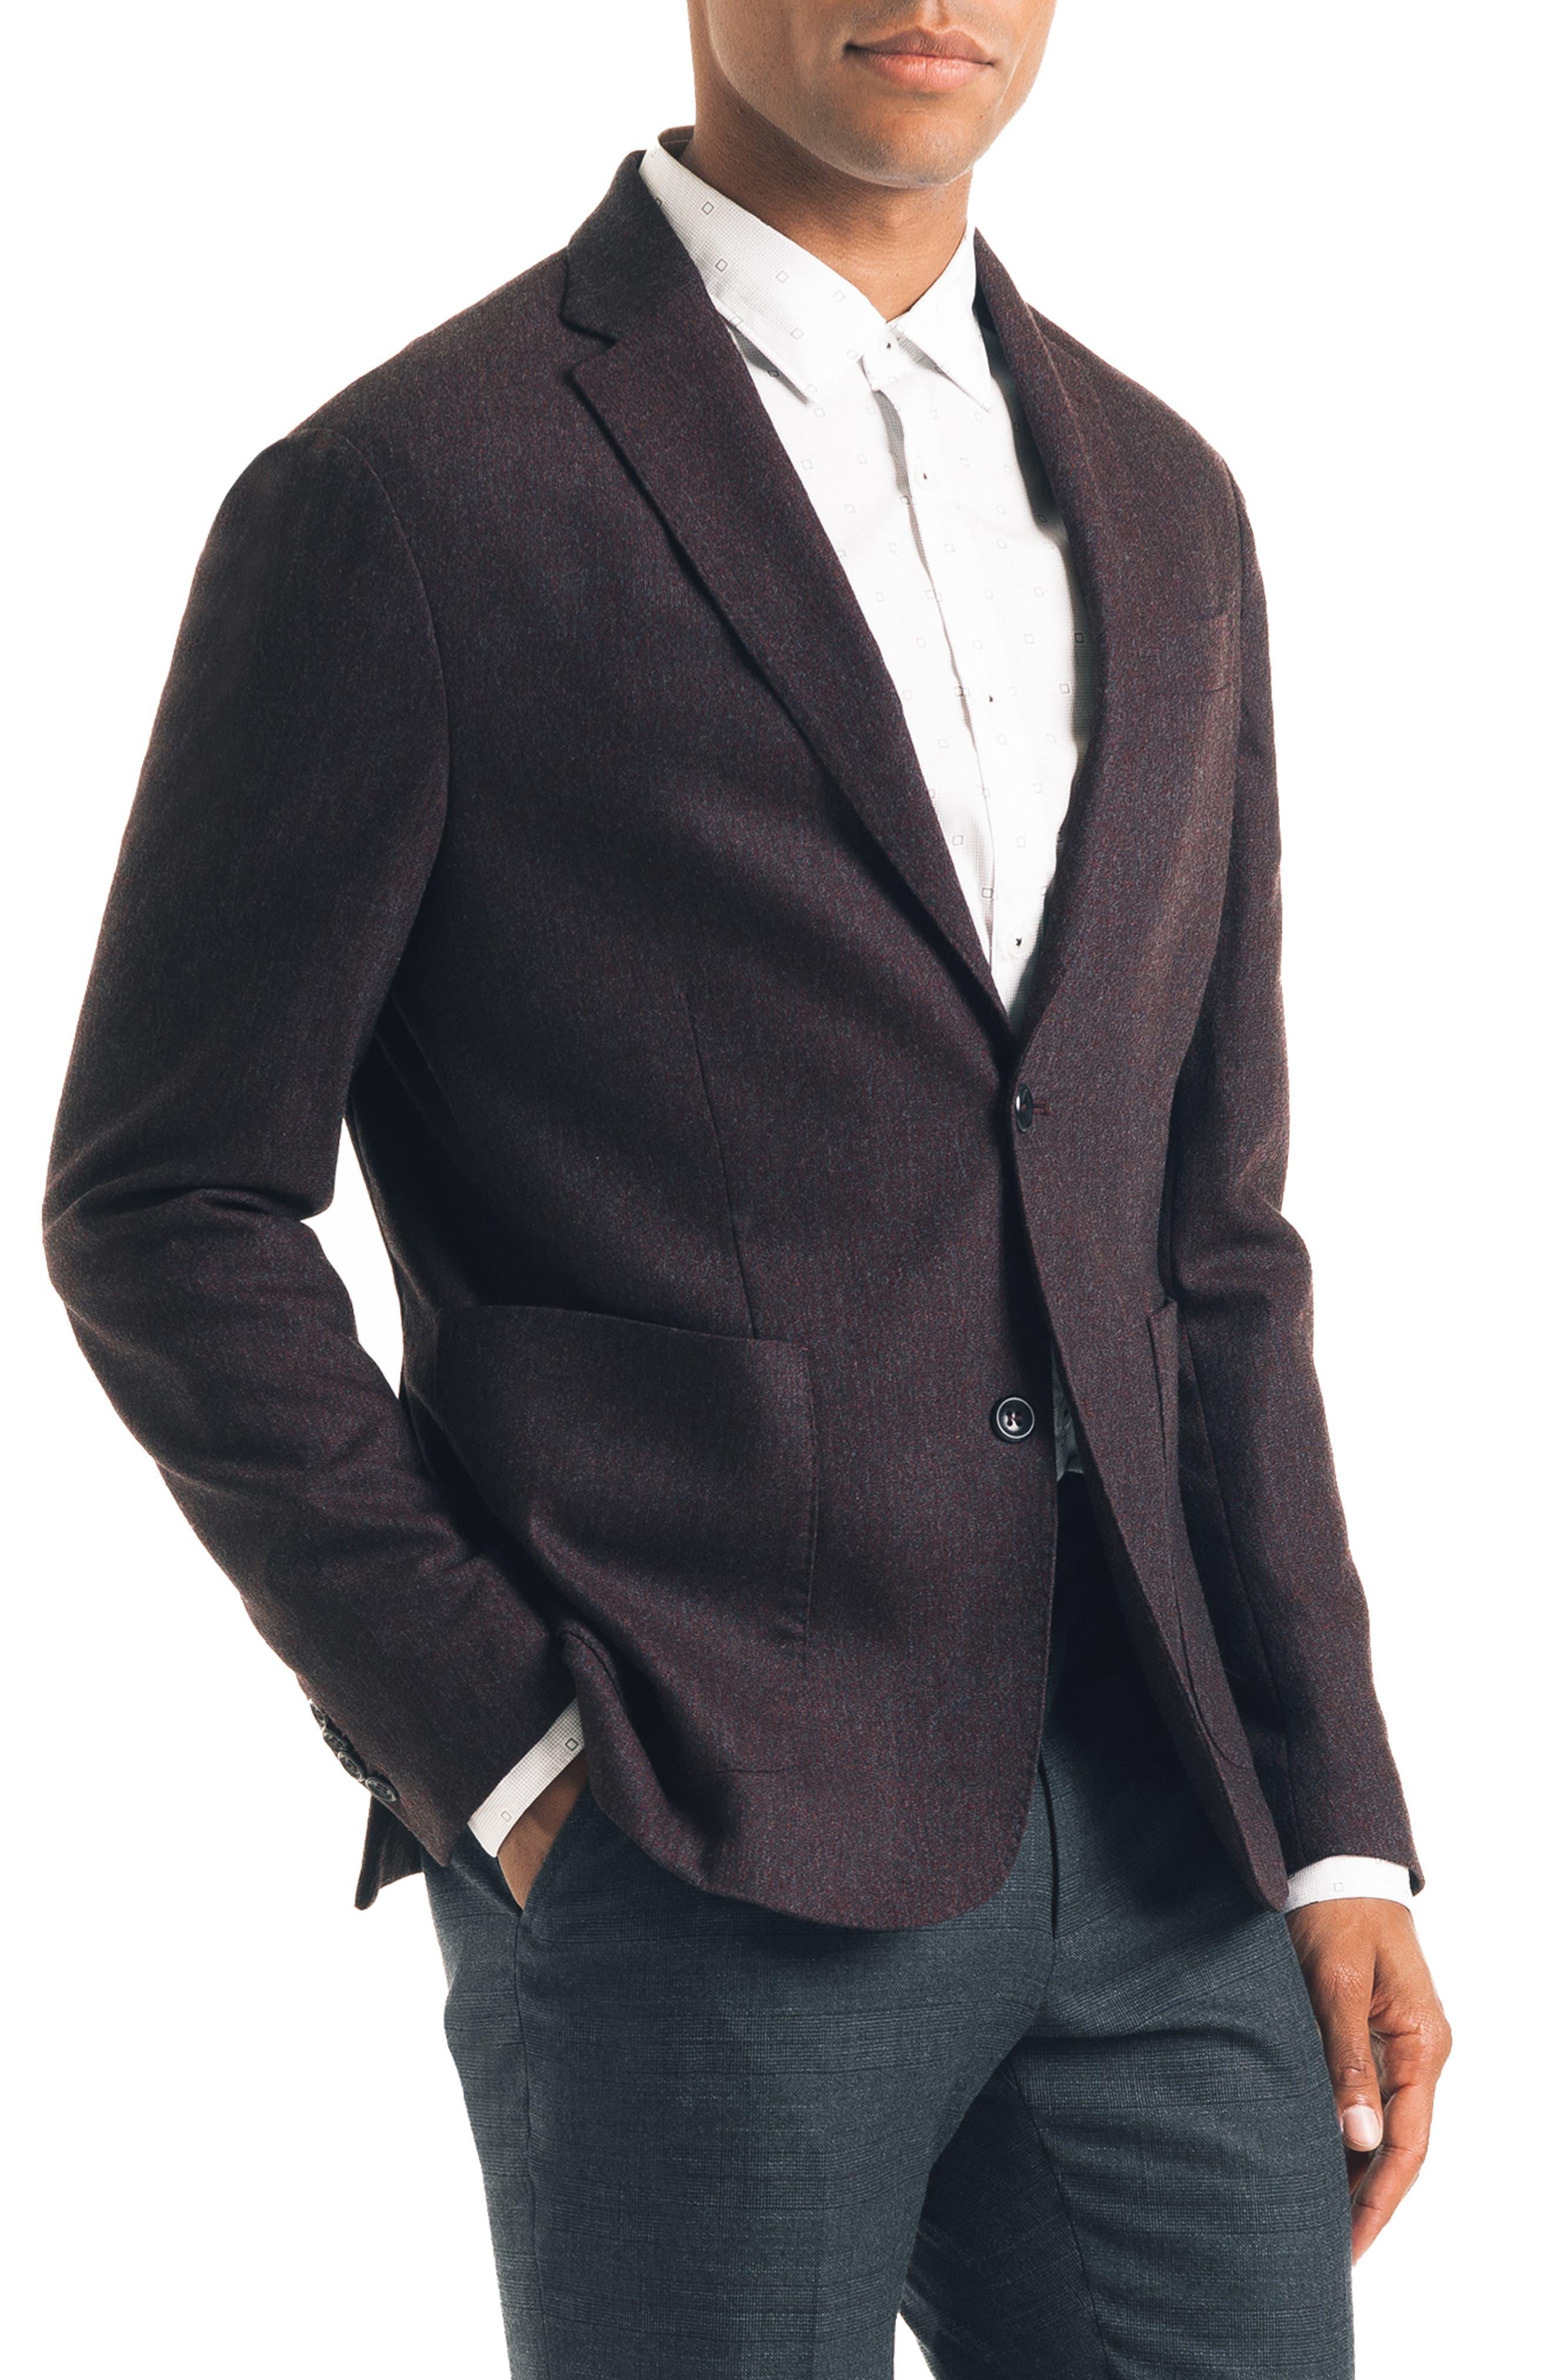 Downtown Trim Fit Stretch Wool Blend Sport Coat,                             Alternate thumbnail 3, color,                             BURGUNDY